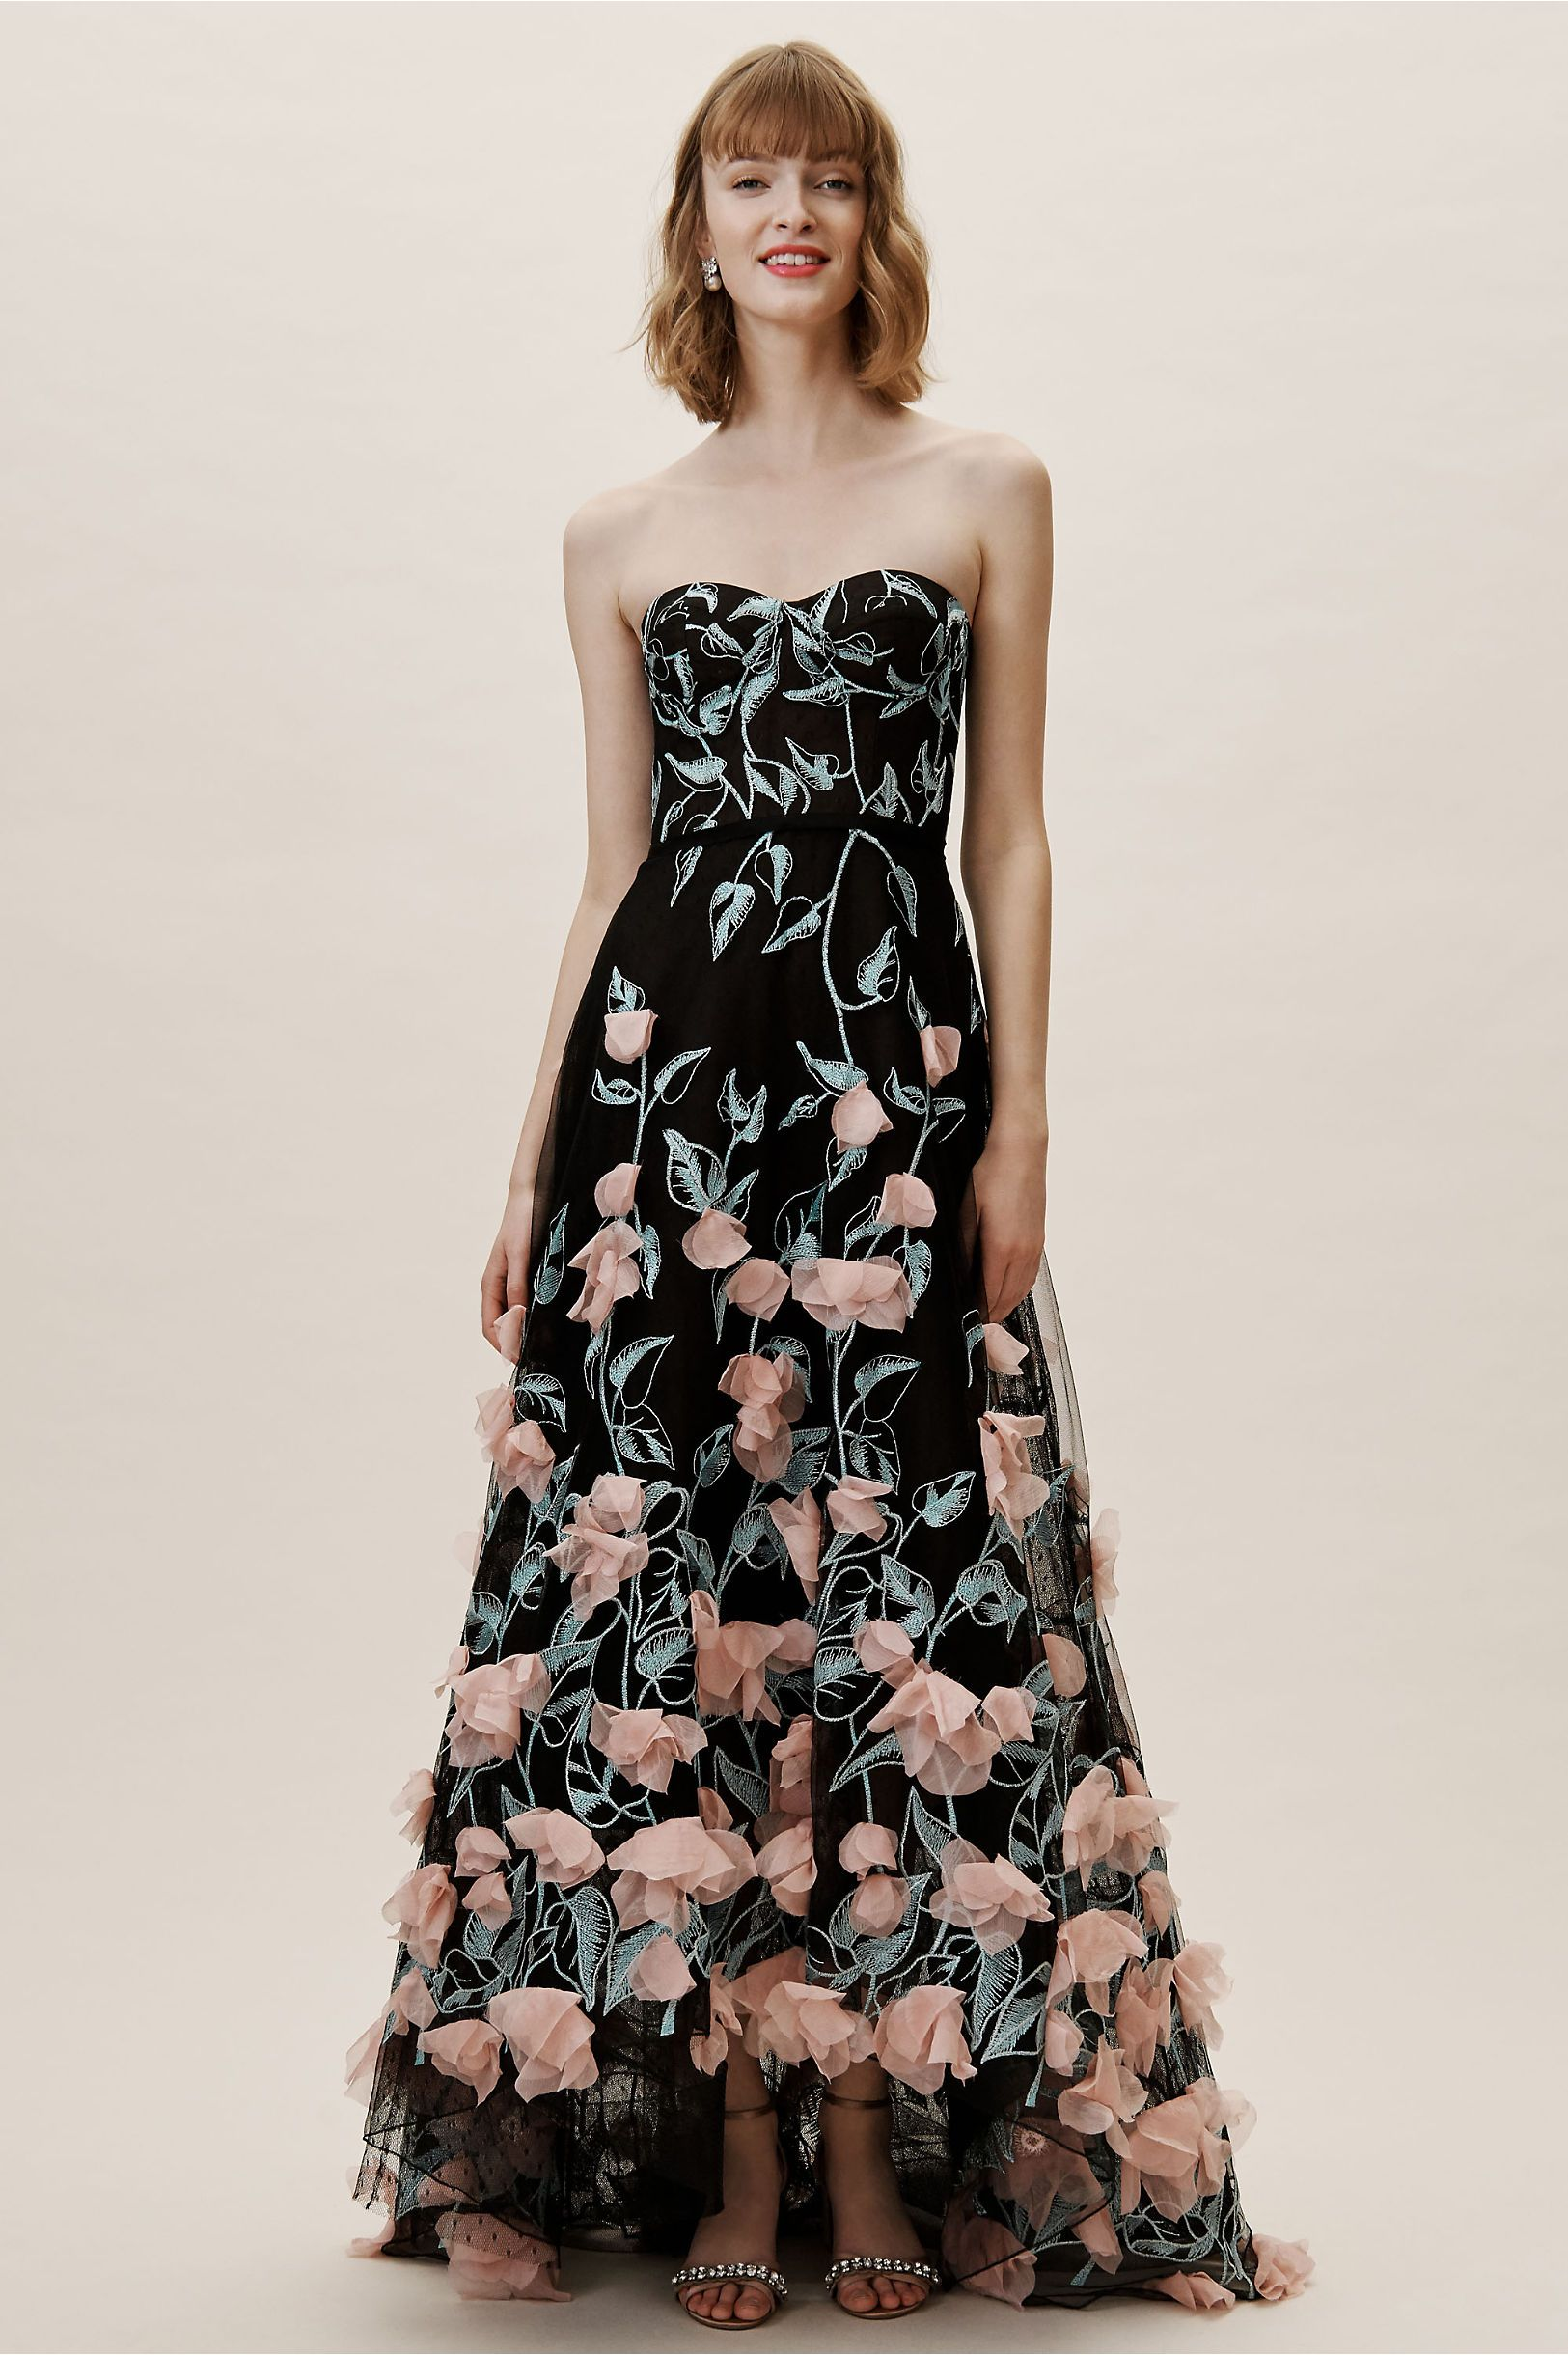 35061204cf5 BHLDN's Marchesa Notte Daveney Dress in Black in 2019 | Products ...